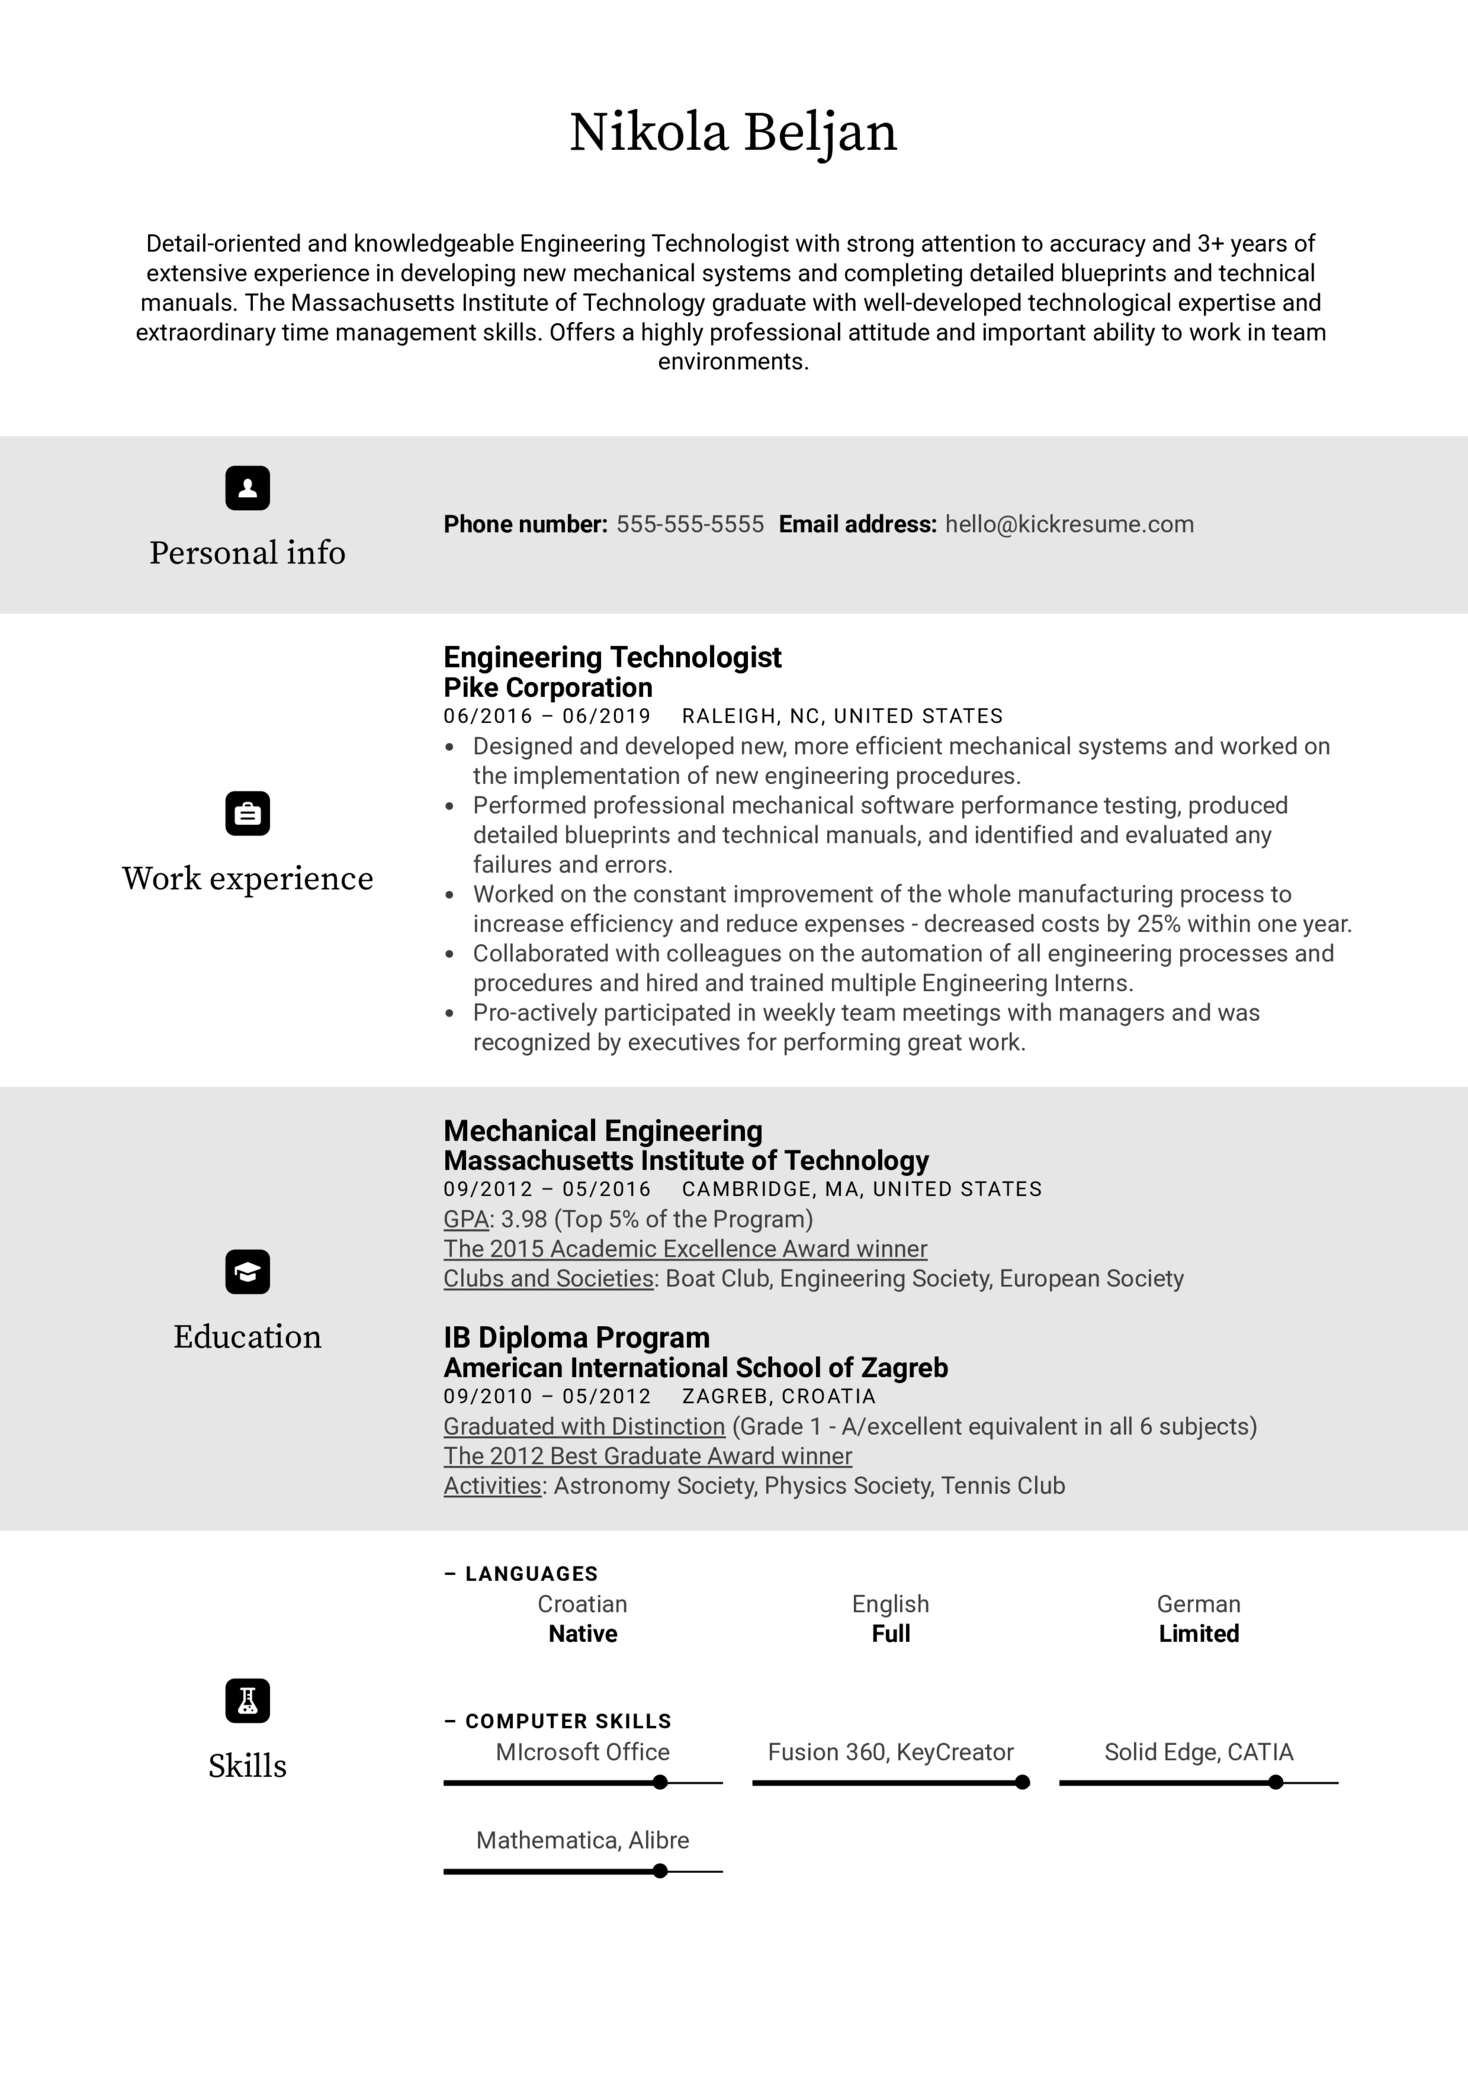 Engineering Technologist Resume Sample (Part 1)